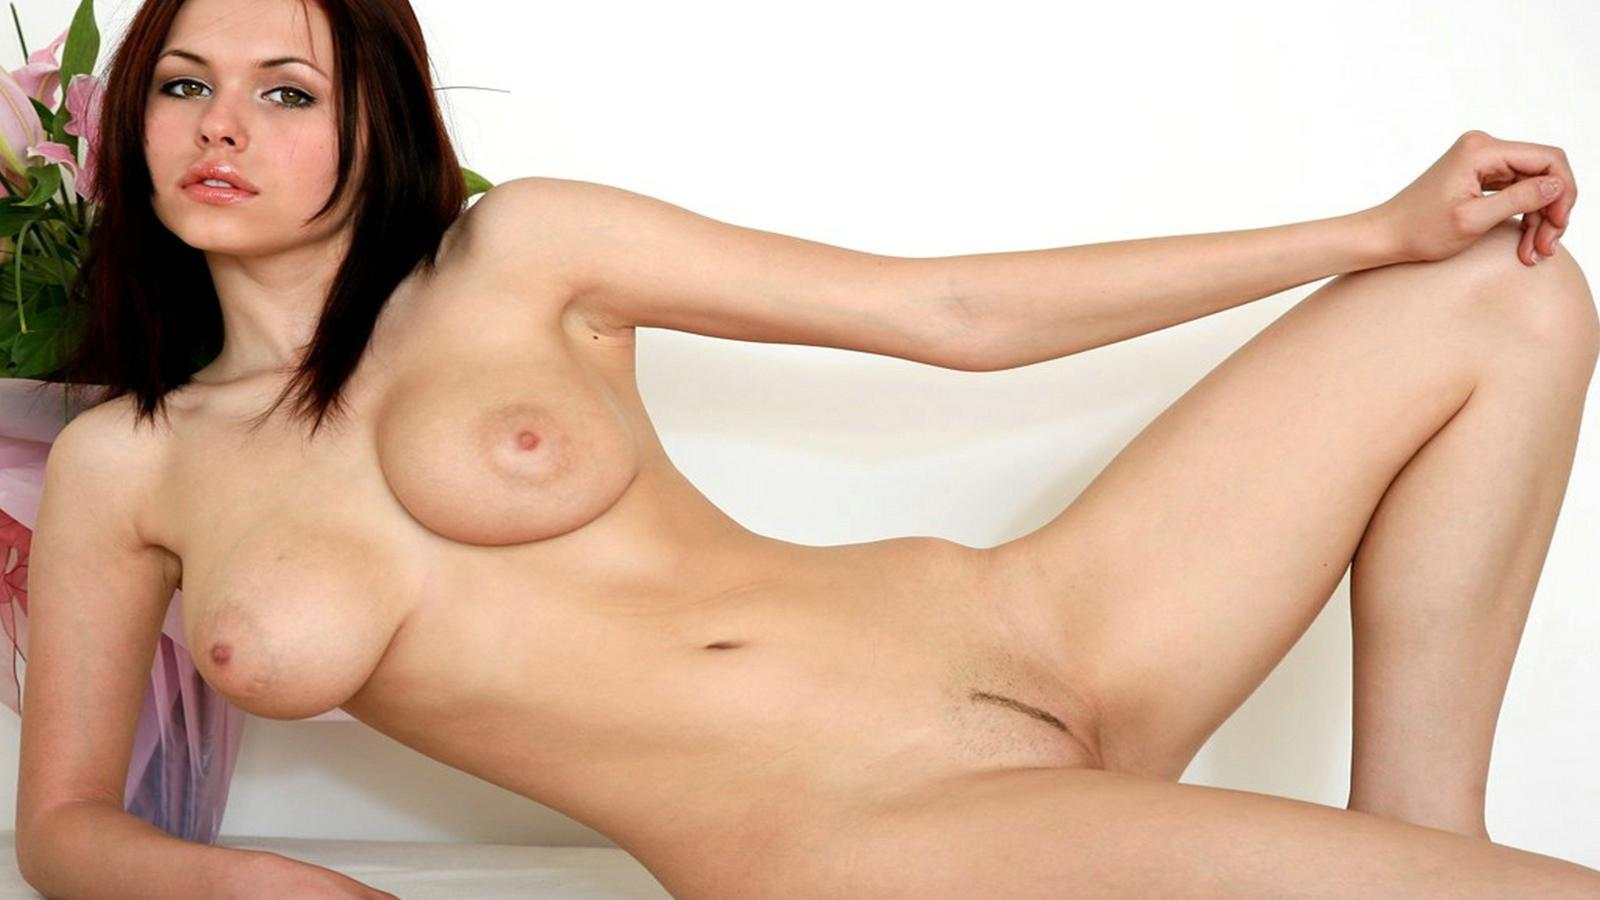 free streaming voyeur porn vids